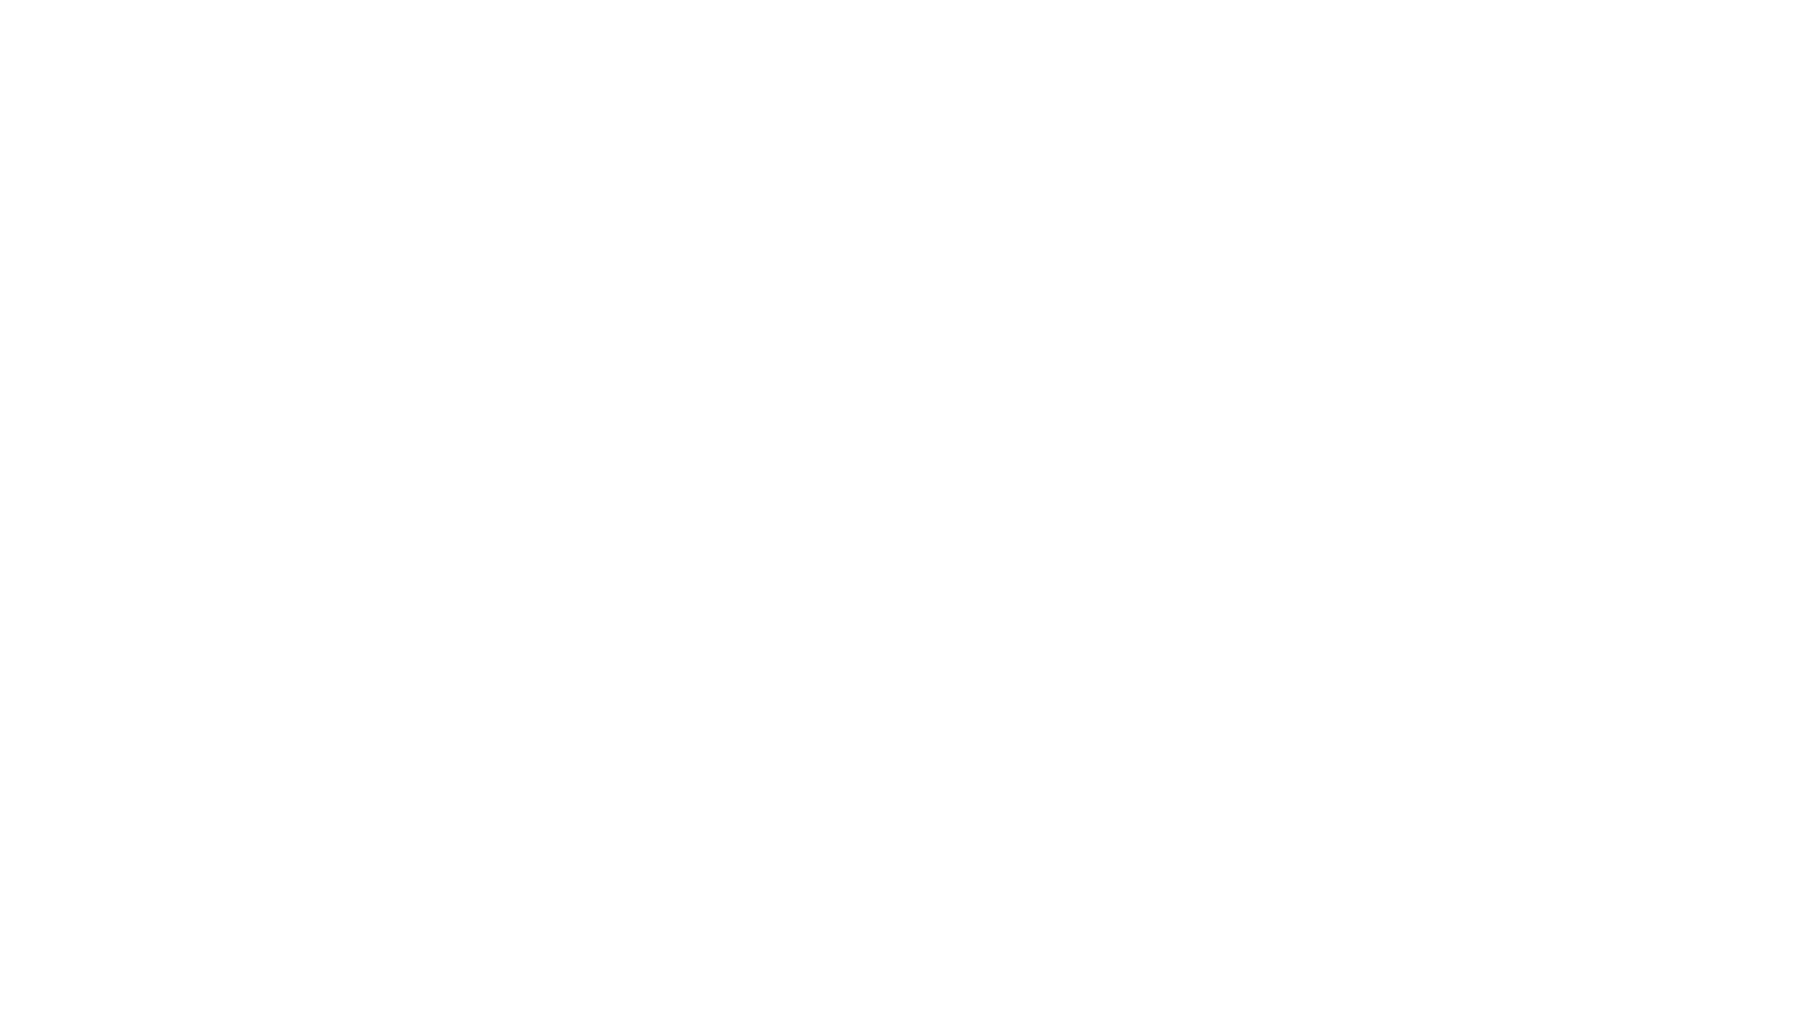 dimensional_lettering_wood-detail